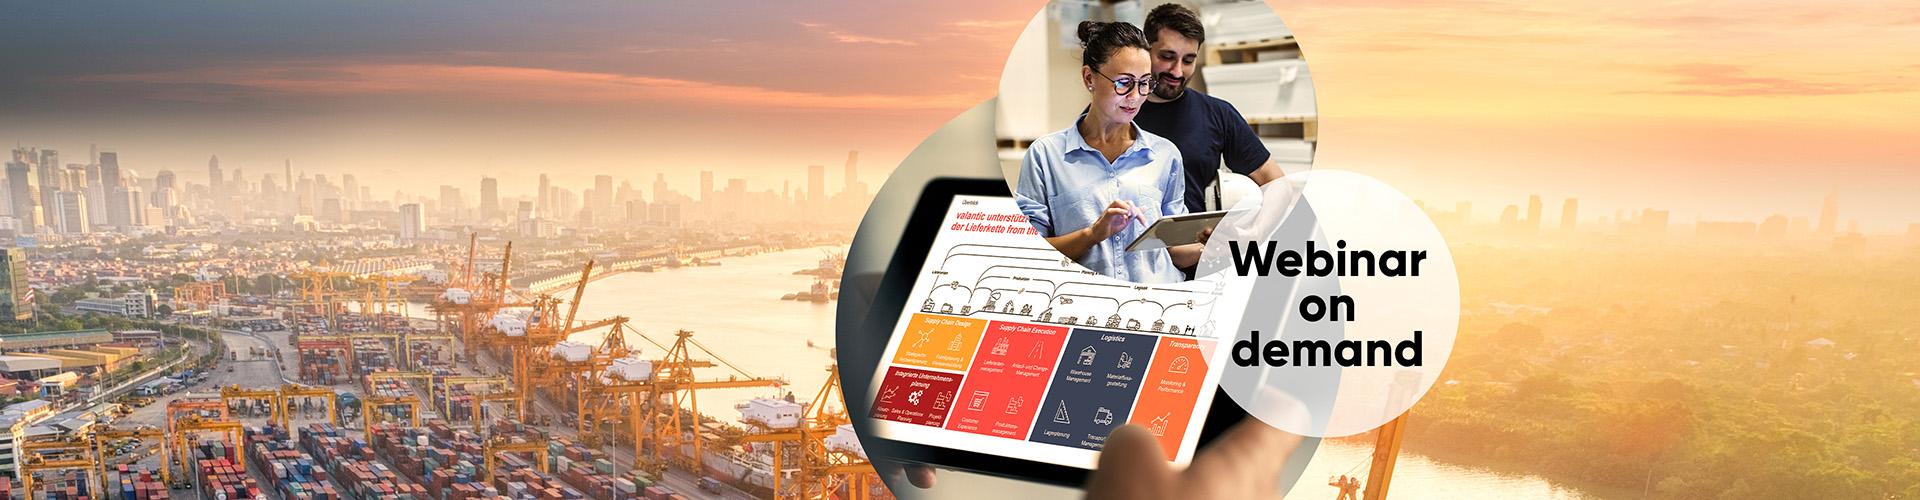 banner_supply-chain-management-logistik_webinar-on-demand